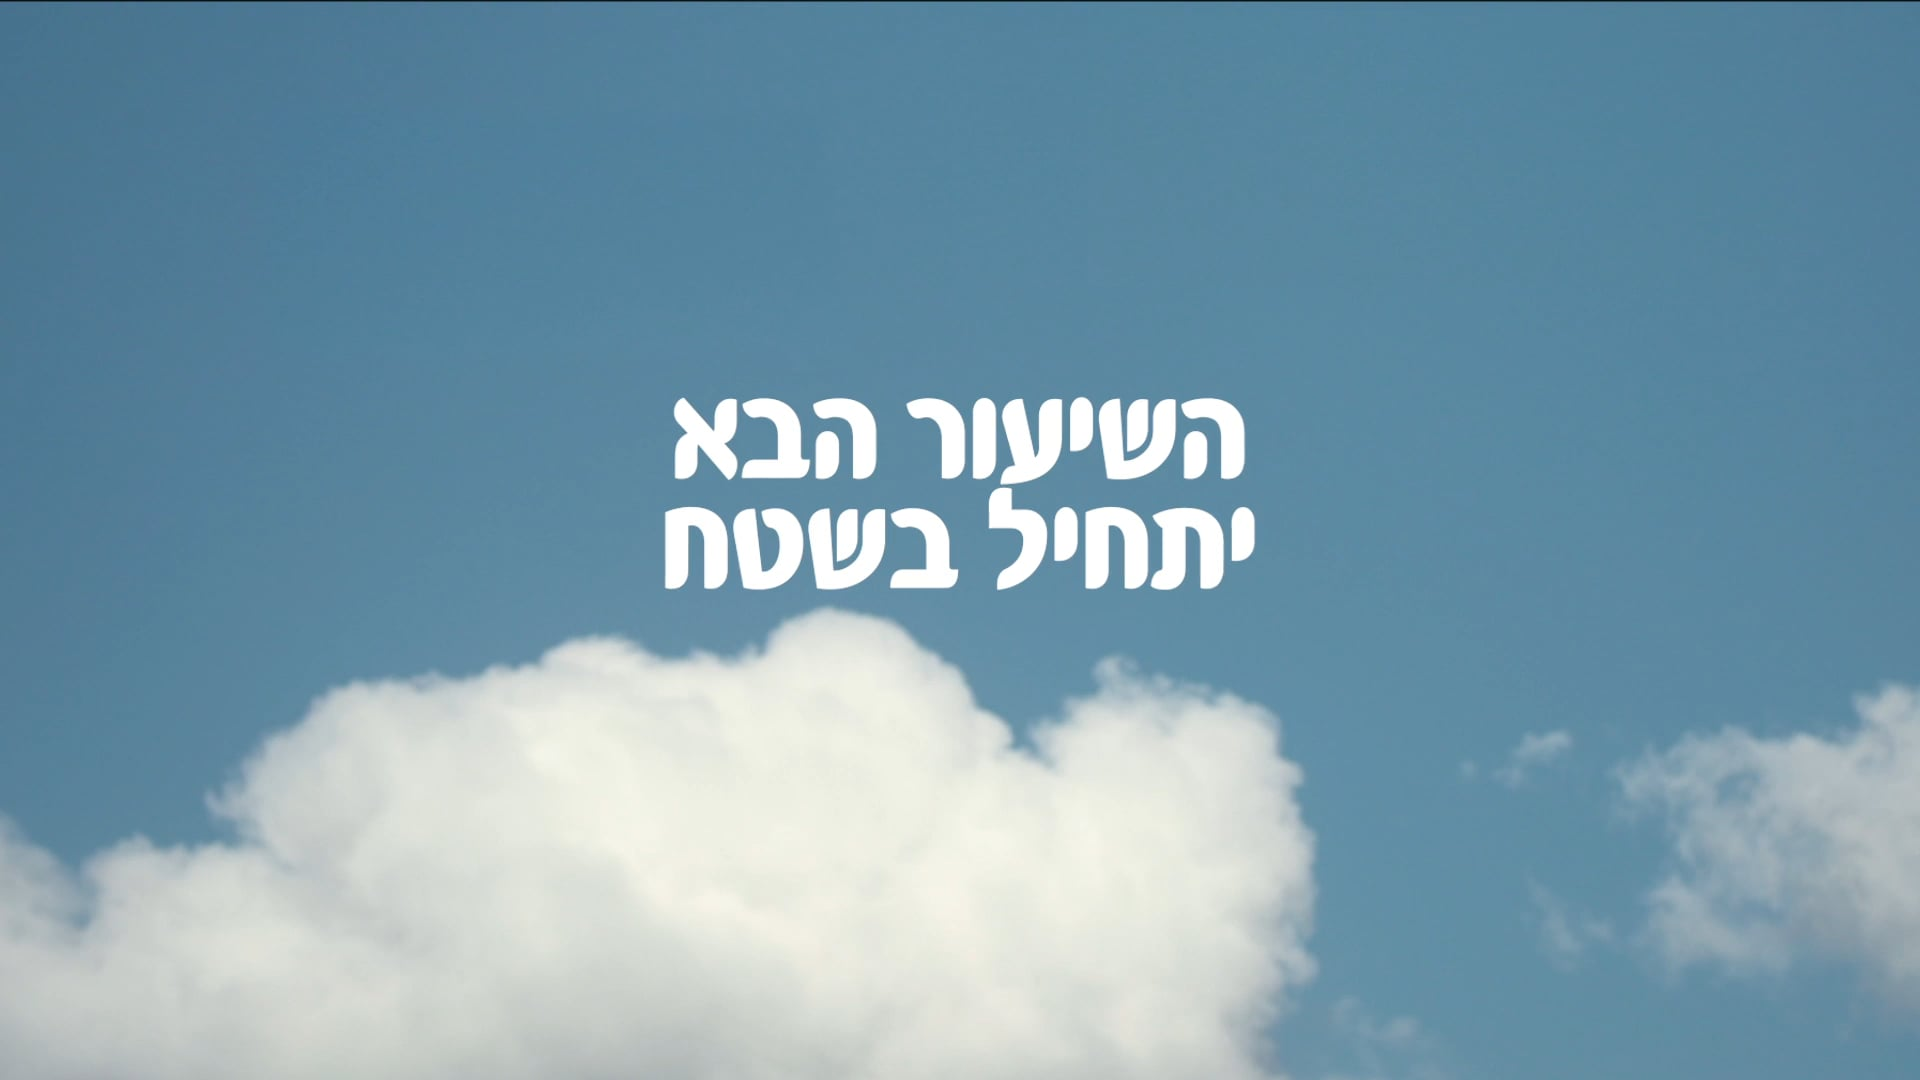 IDF AUG 18' VIDEO